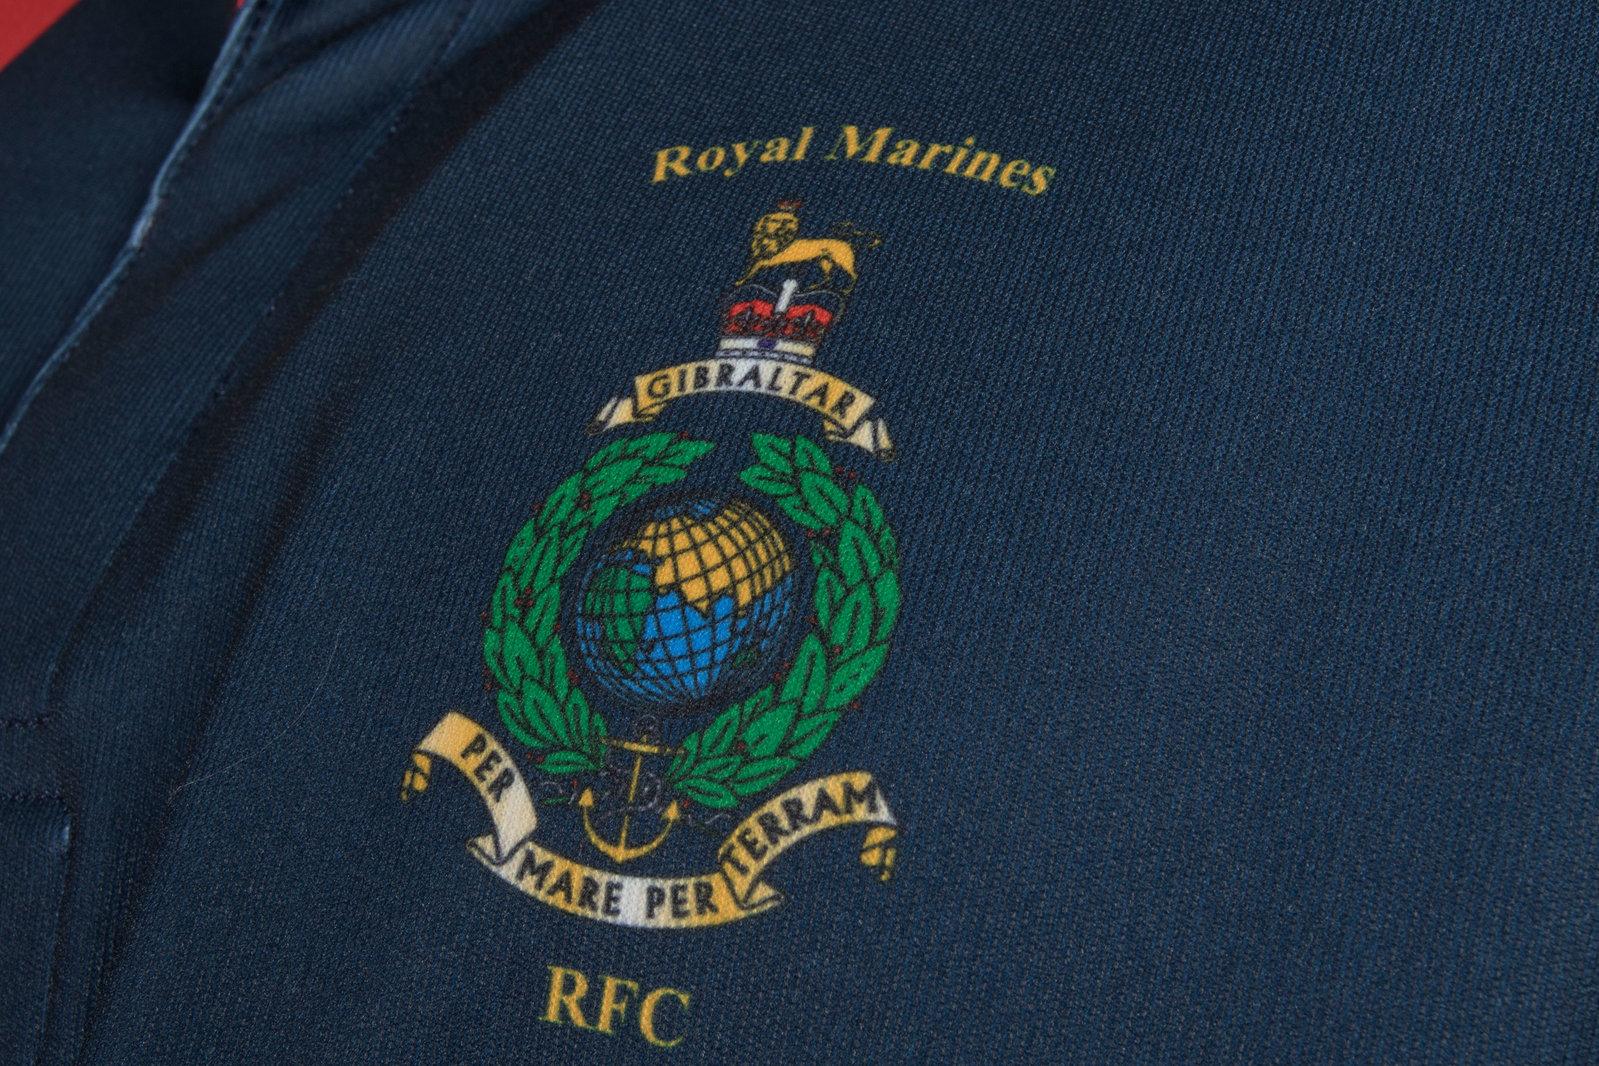 c502603c1 Kitworld Royal Marines Home 2017 18 S S Replica Shirt Top Clothing Sports